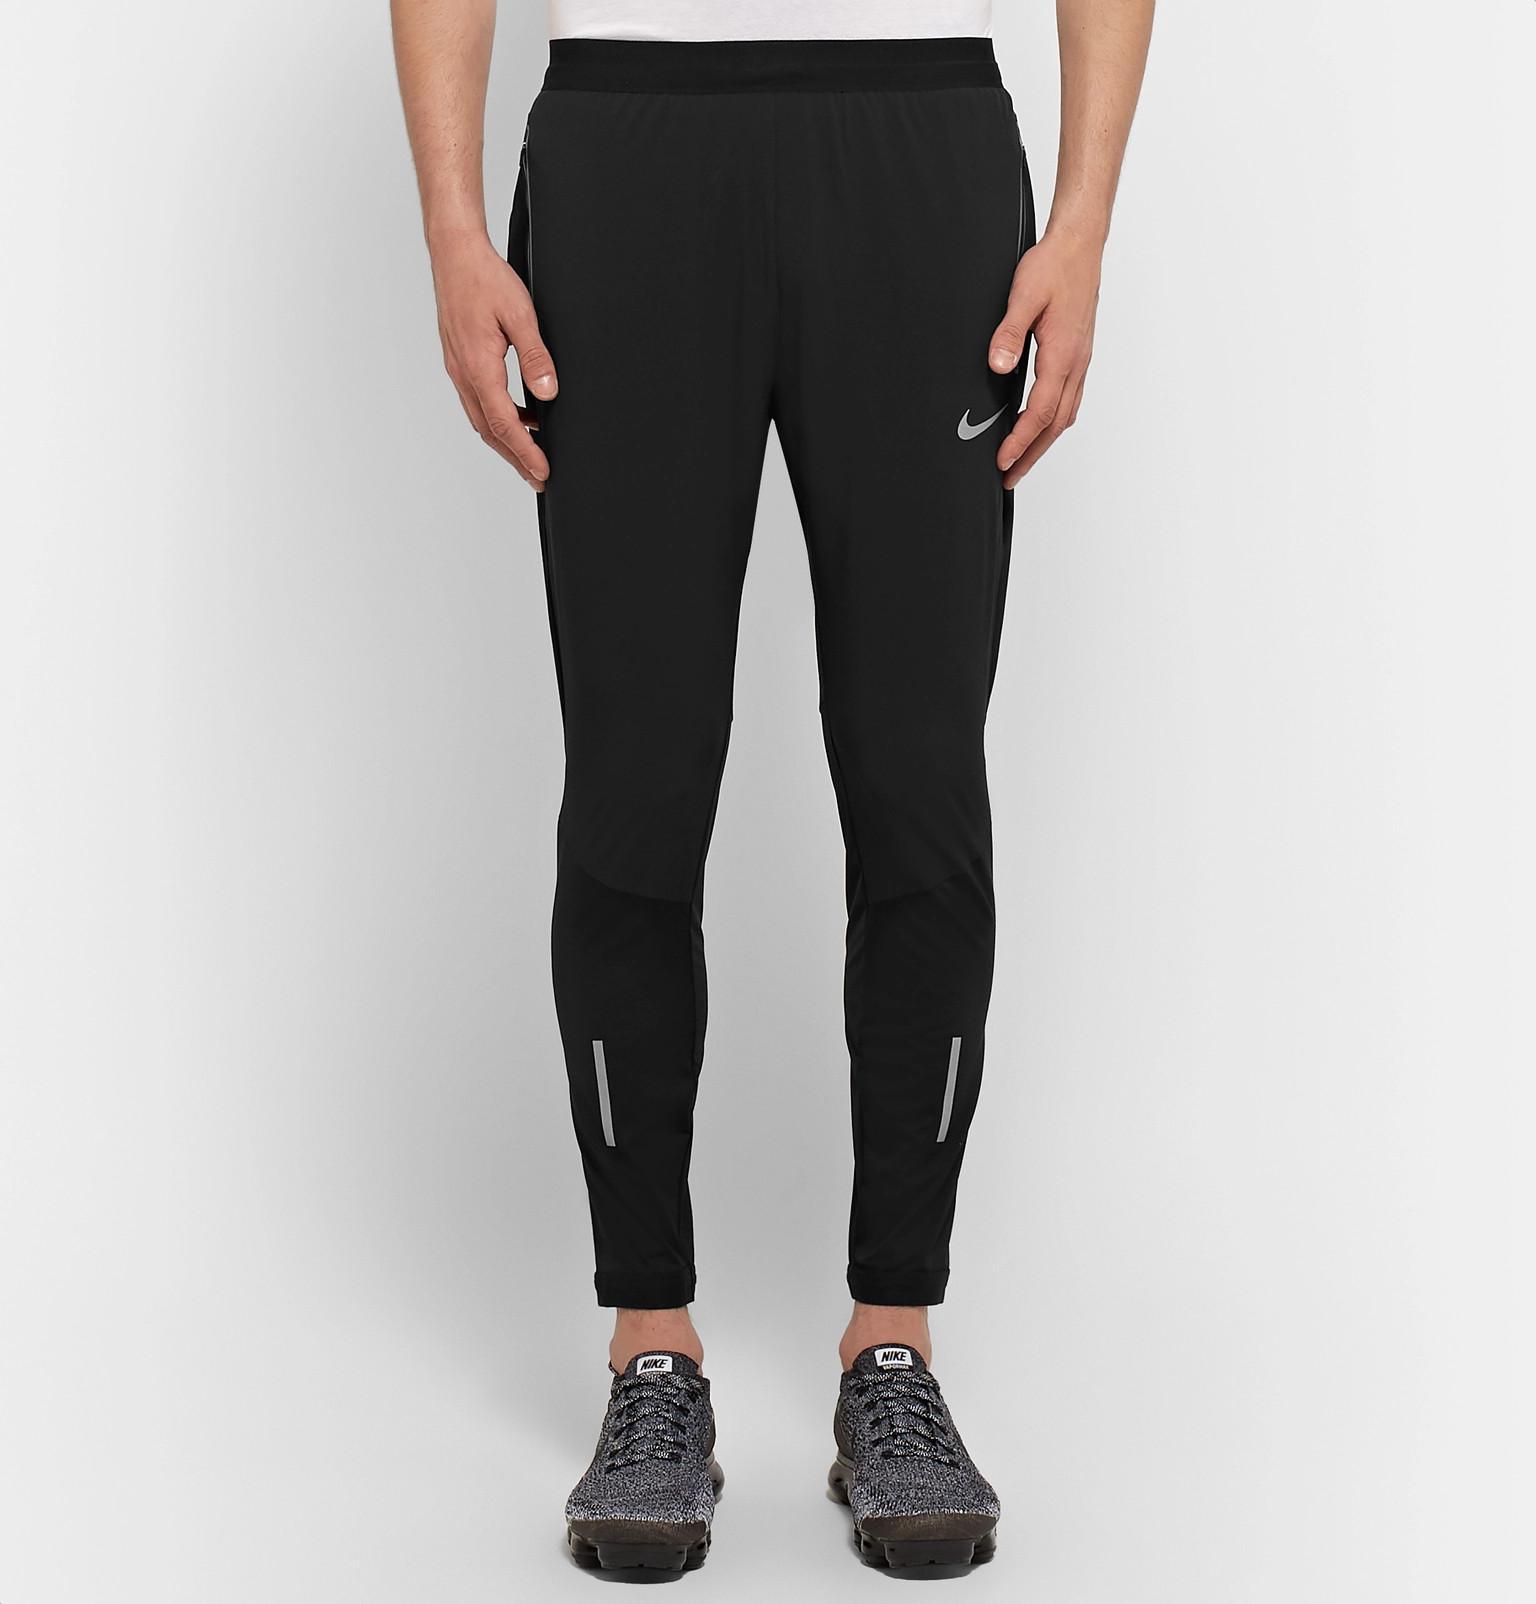 a968f358786d Lyst - Nike Swift Panelled Dri-fit Sweatpants in Black for Men